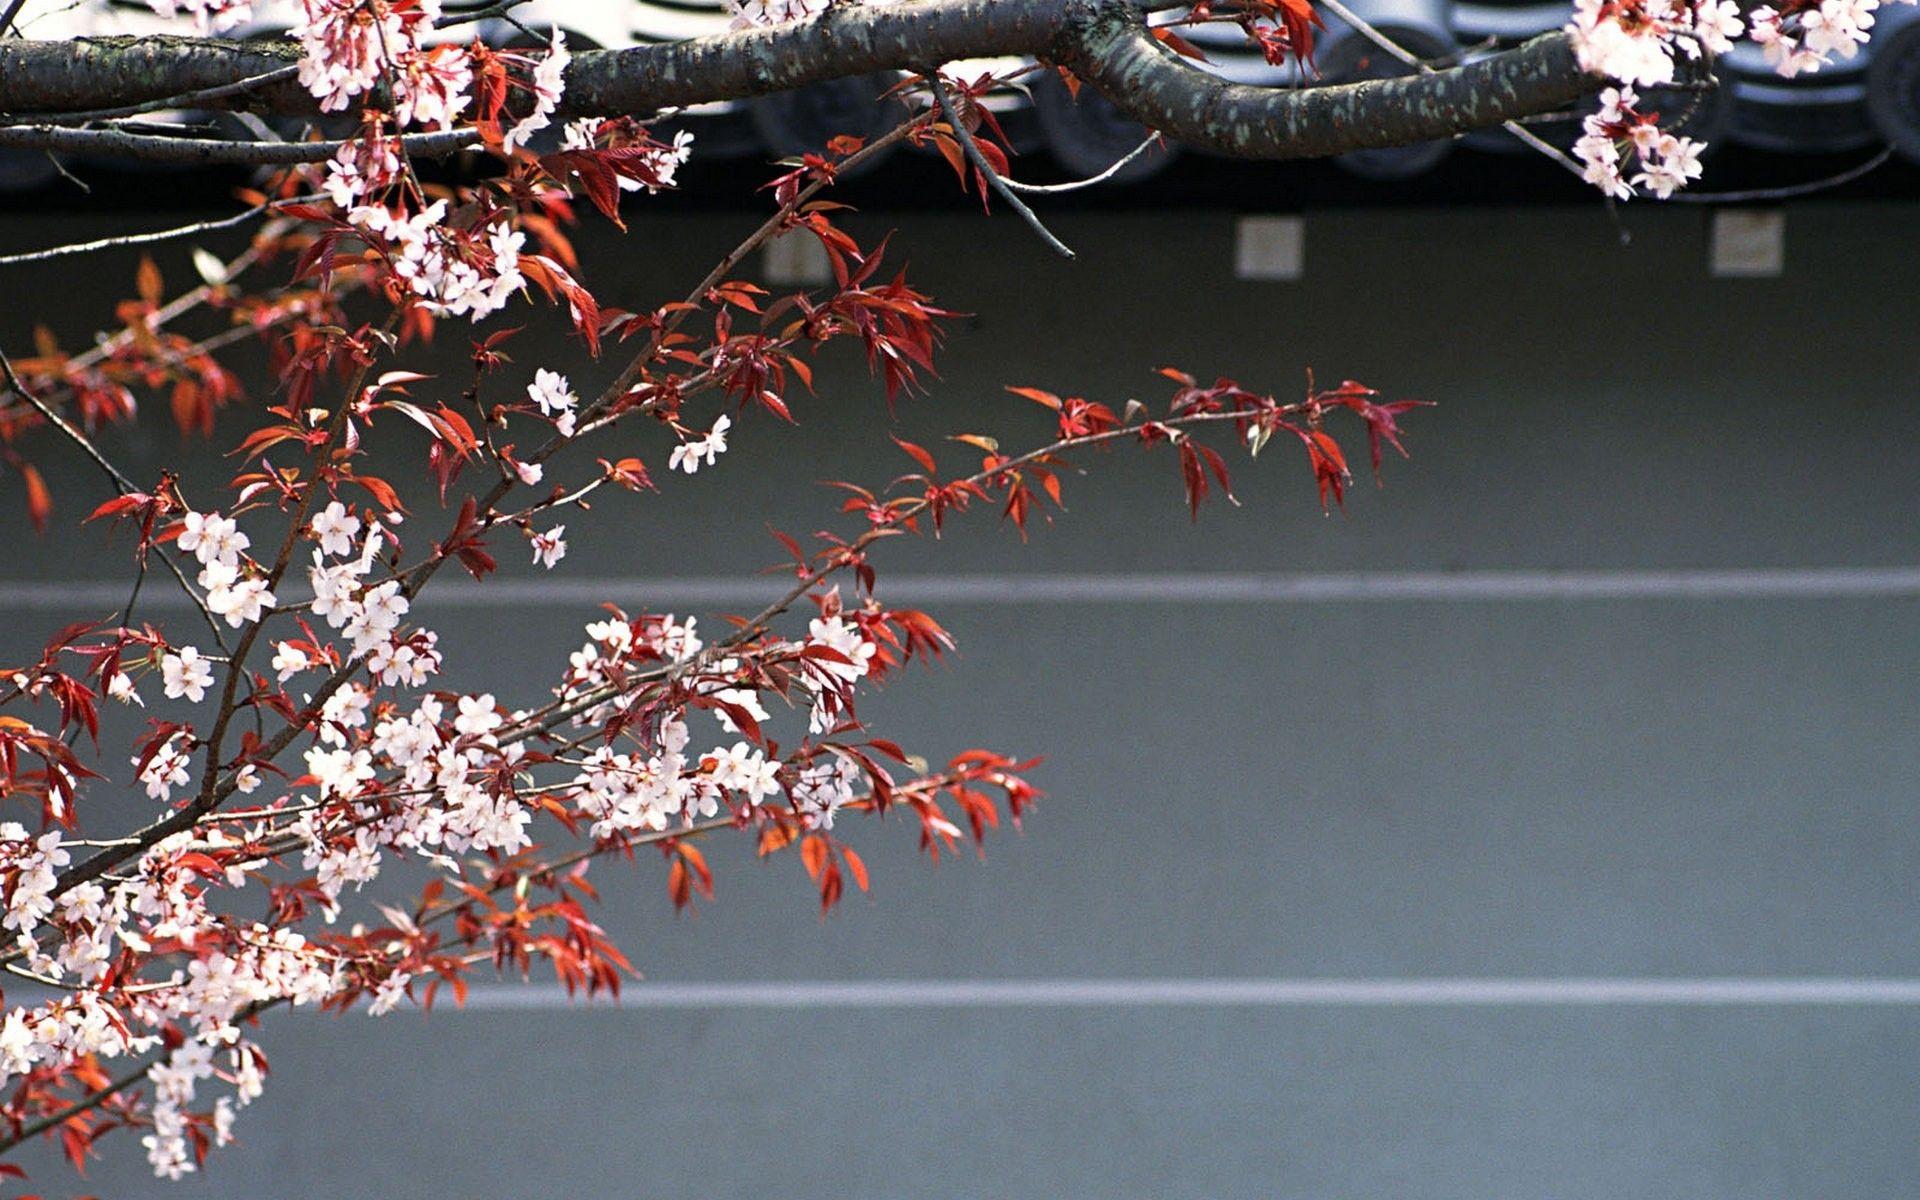 Japan cherry blossoms flowers (1920x1200, cherry, blossoms, flowers)  via www.allwallpaper.in